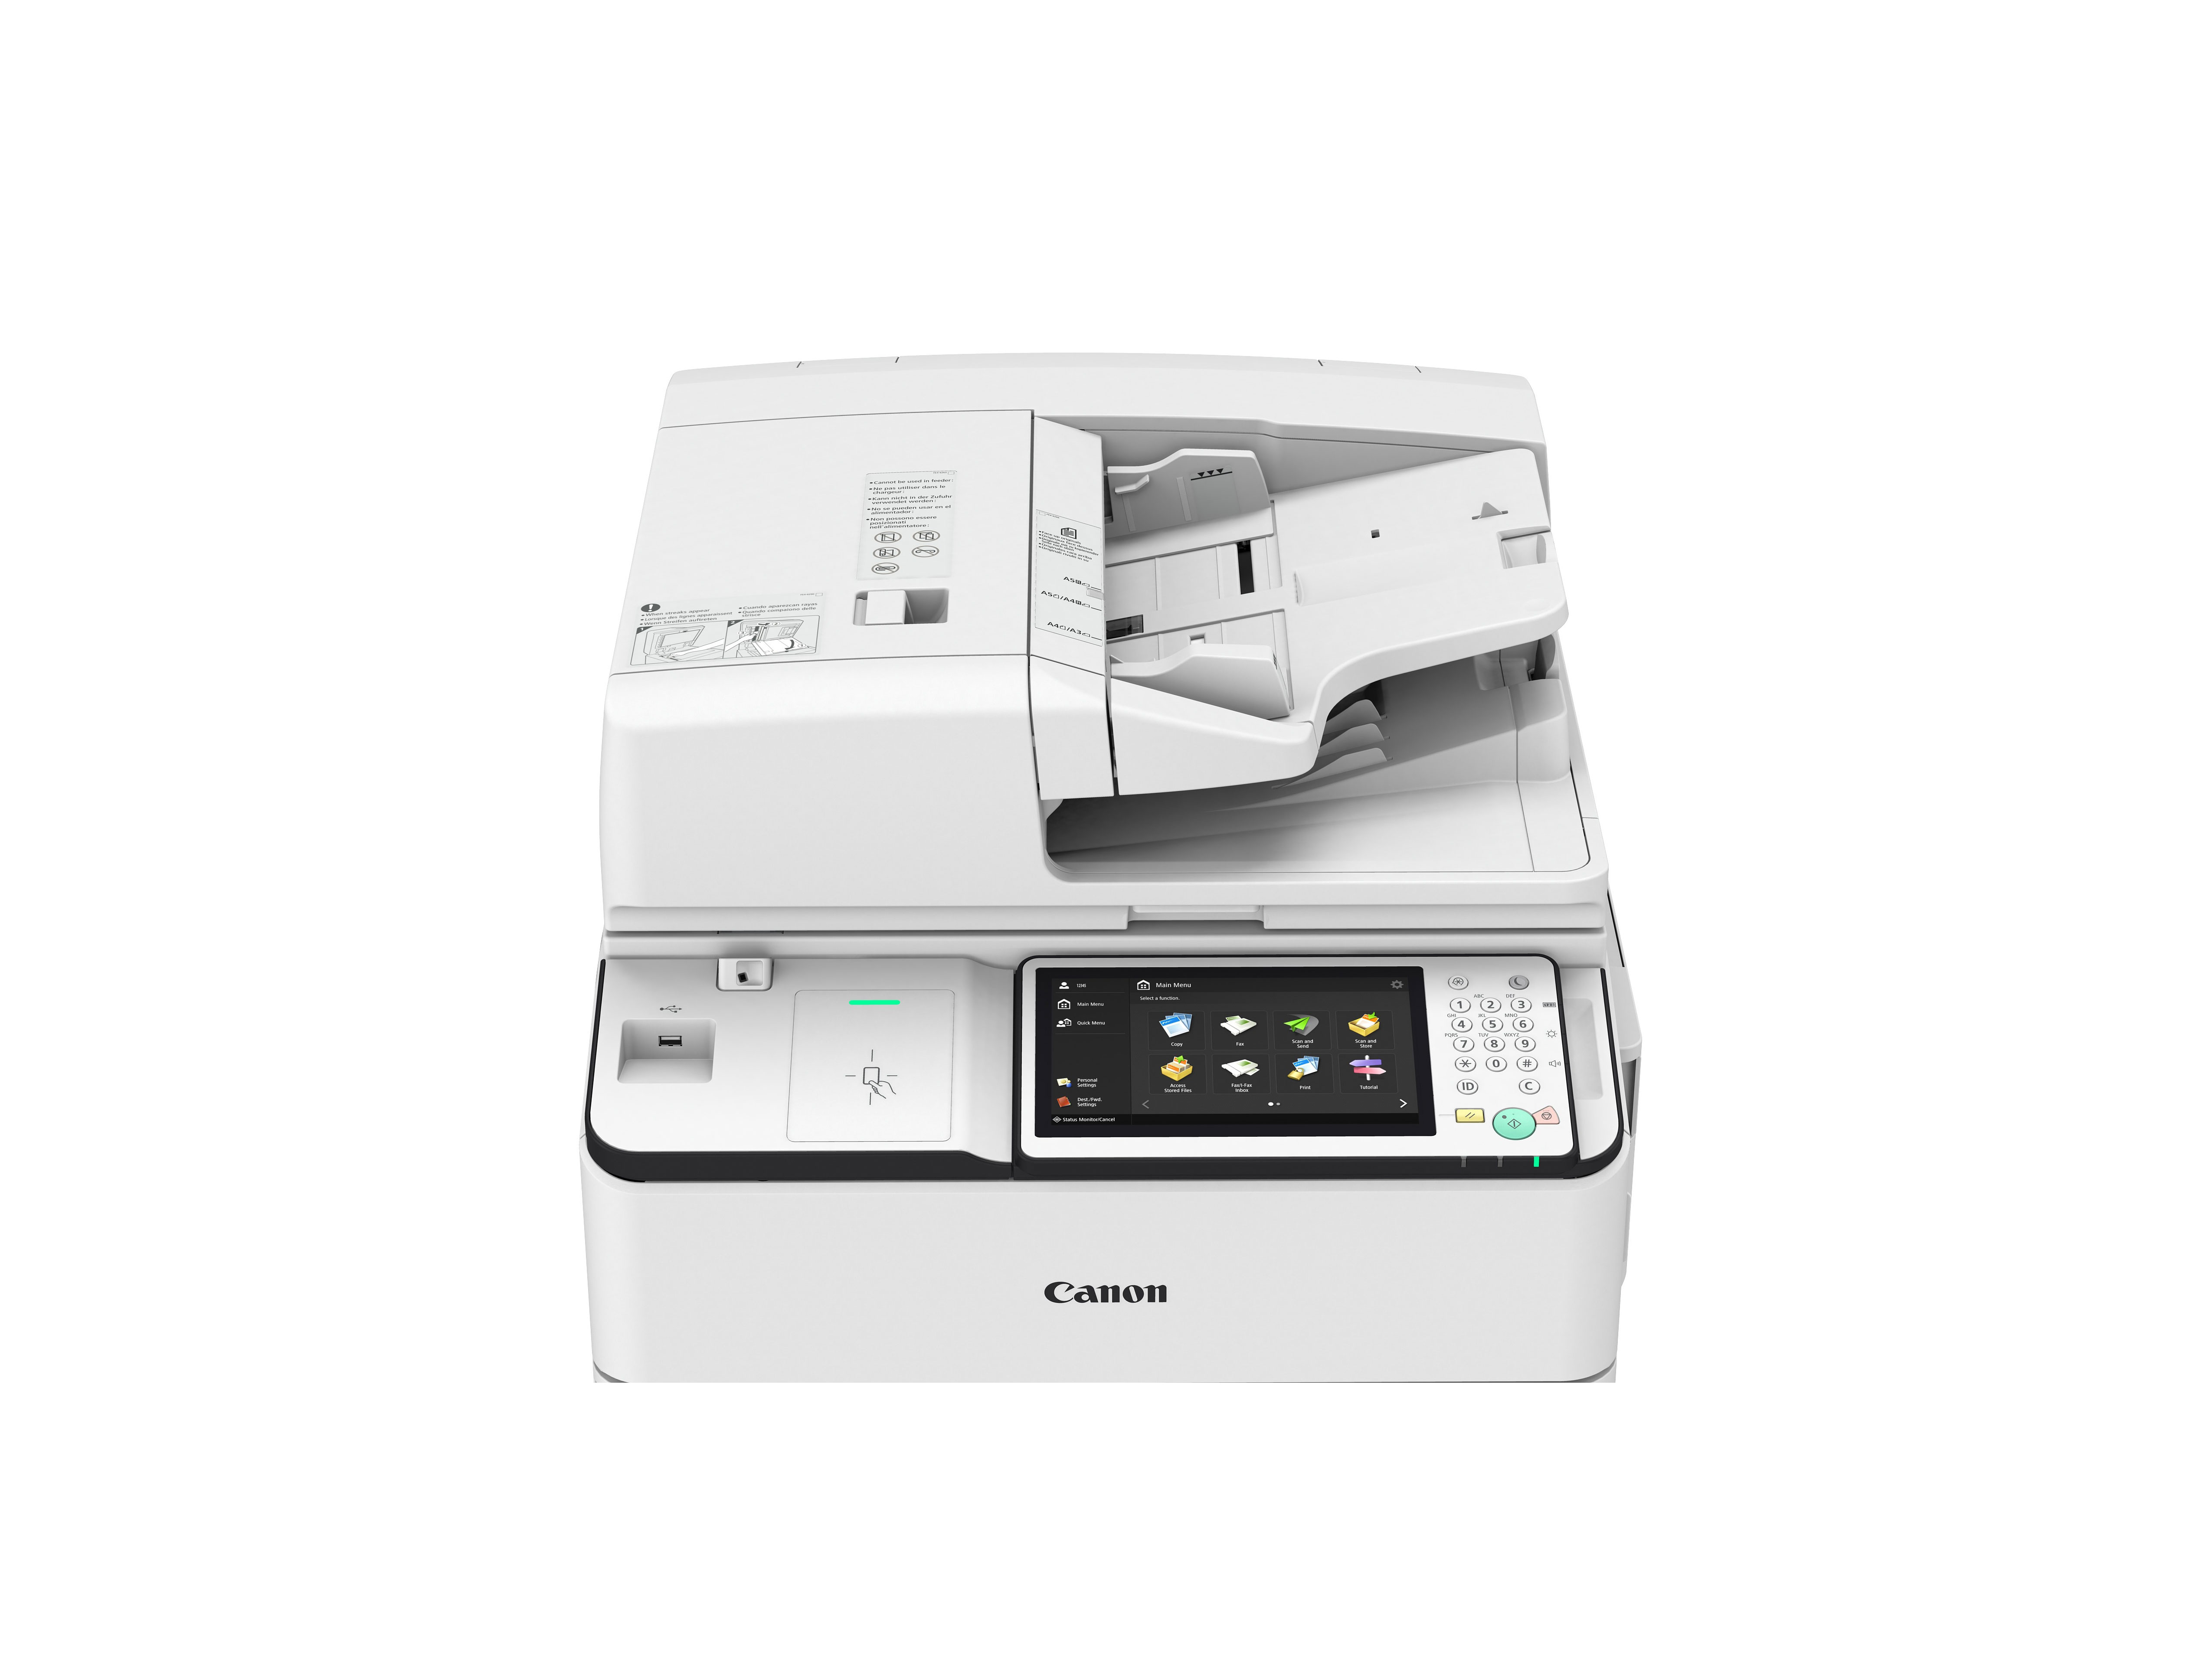 Fotocopiadora imageRUNNER ADVANCE 6565i II usada